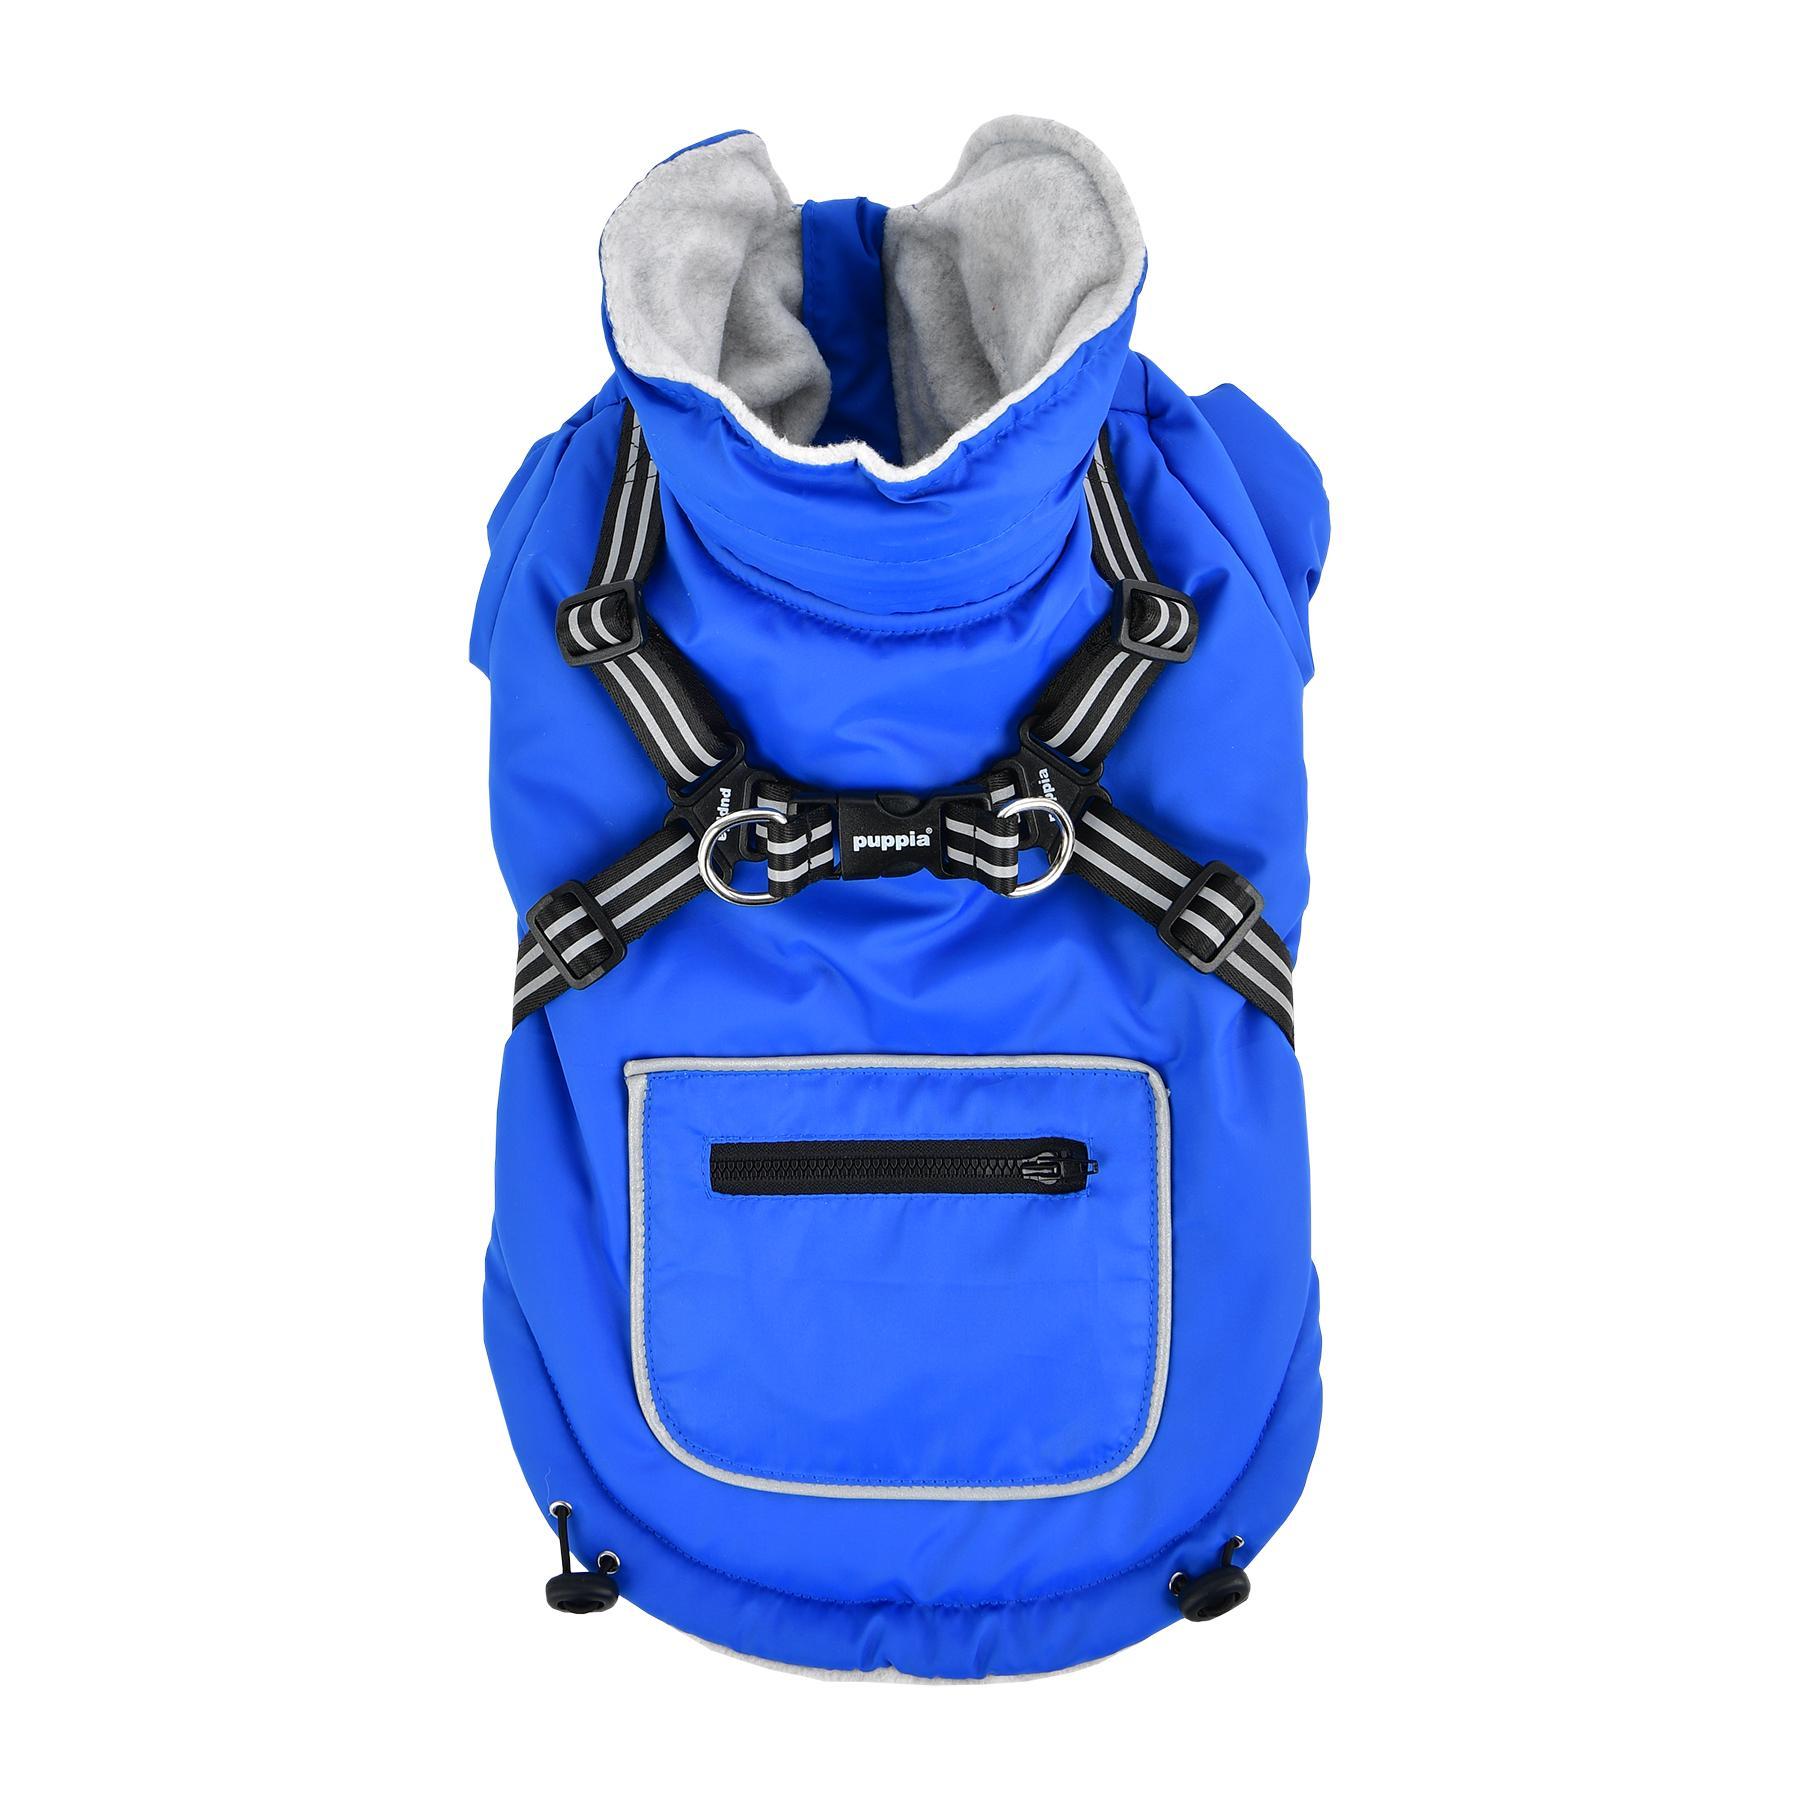 Mallory Fleece Dog Vest By Puppia - Royal Blue